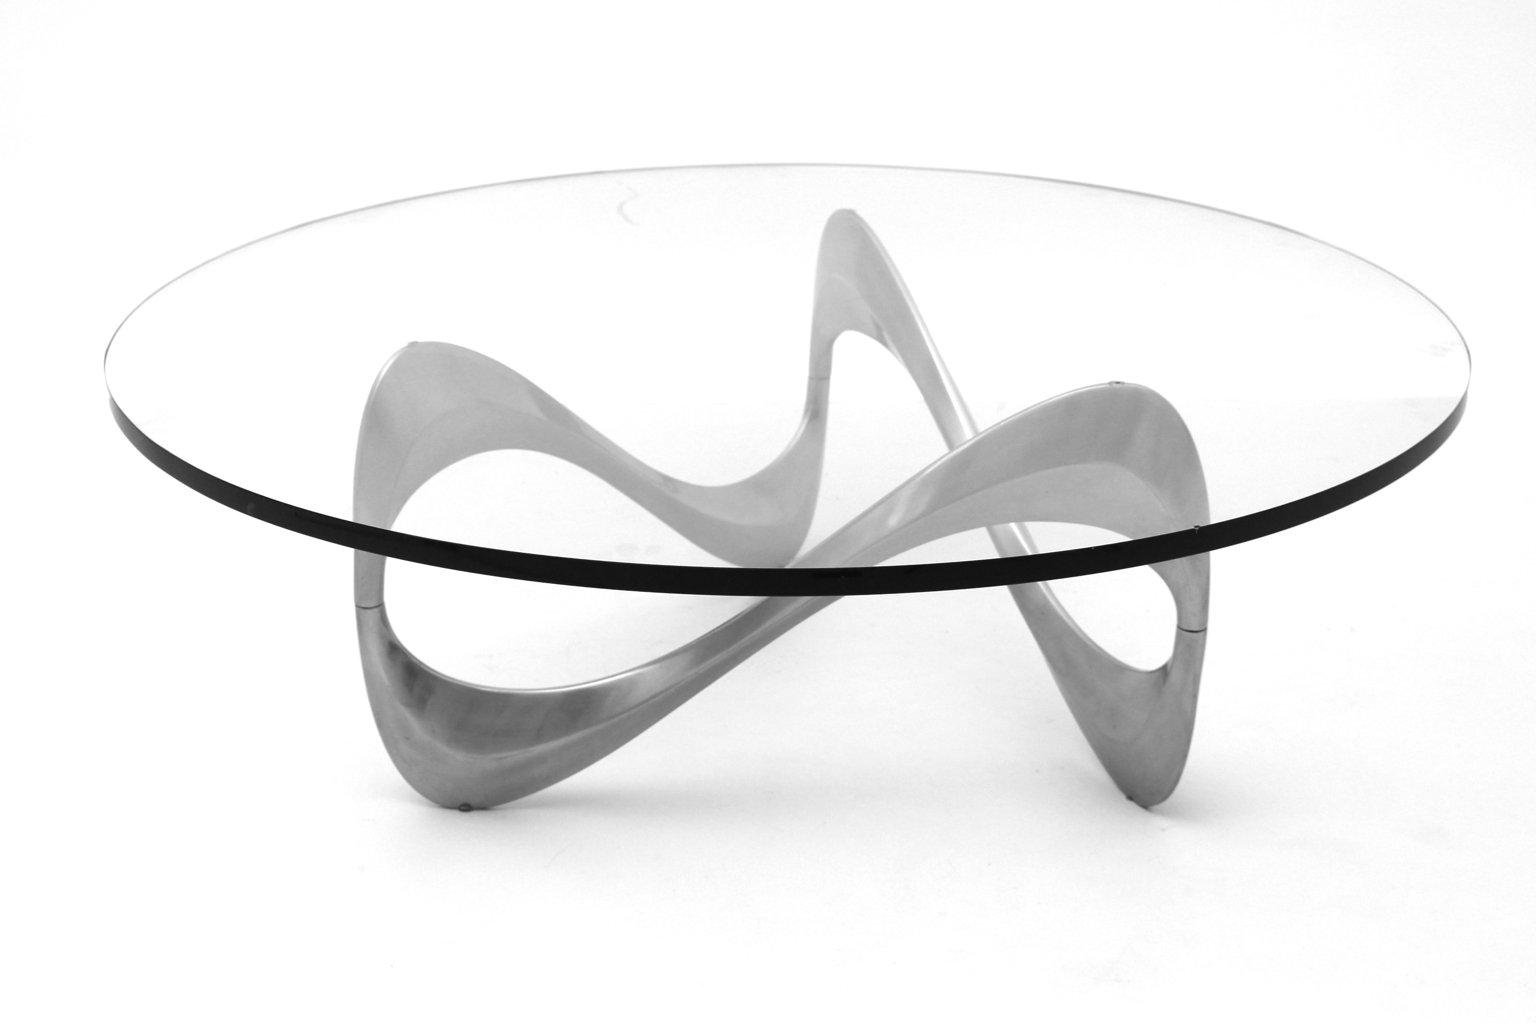 Vintage Aluminum Coffee Table By Knut Hesterberg